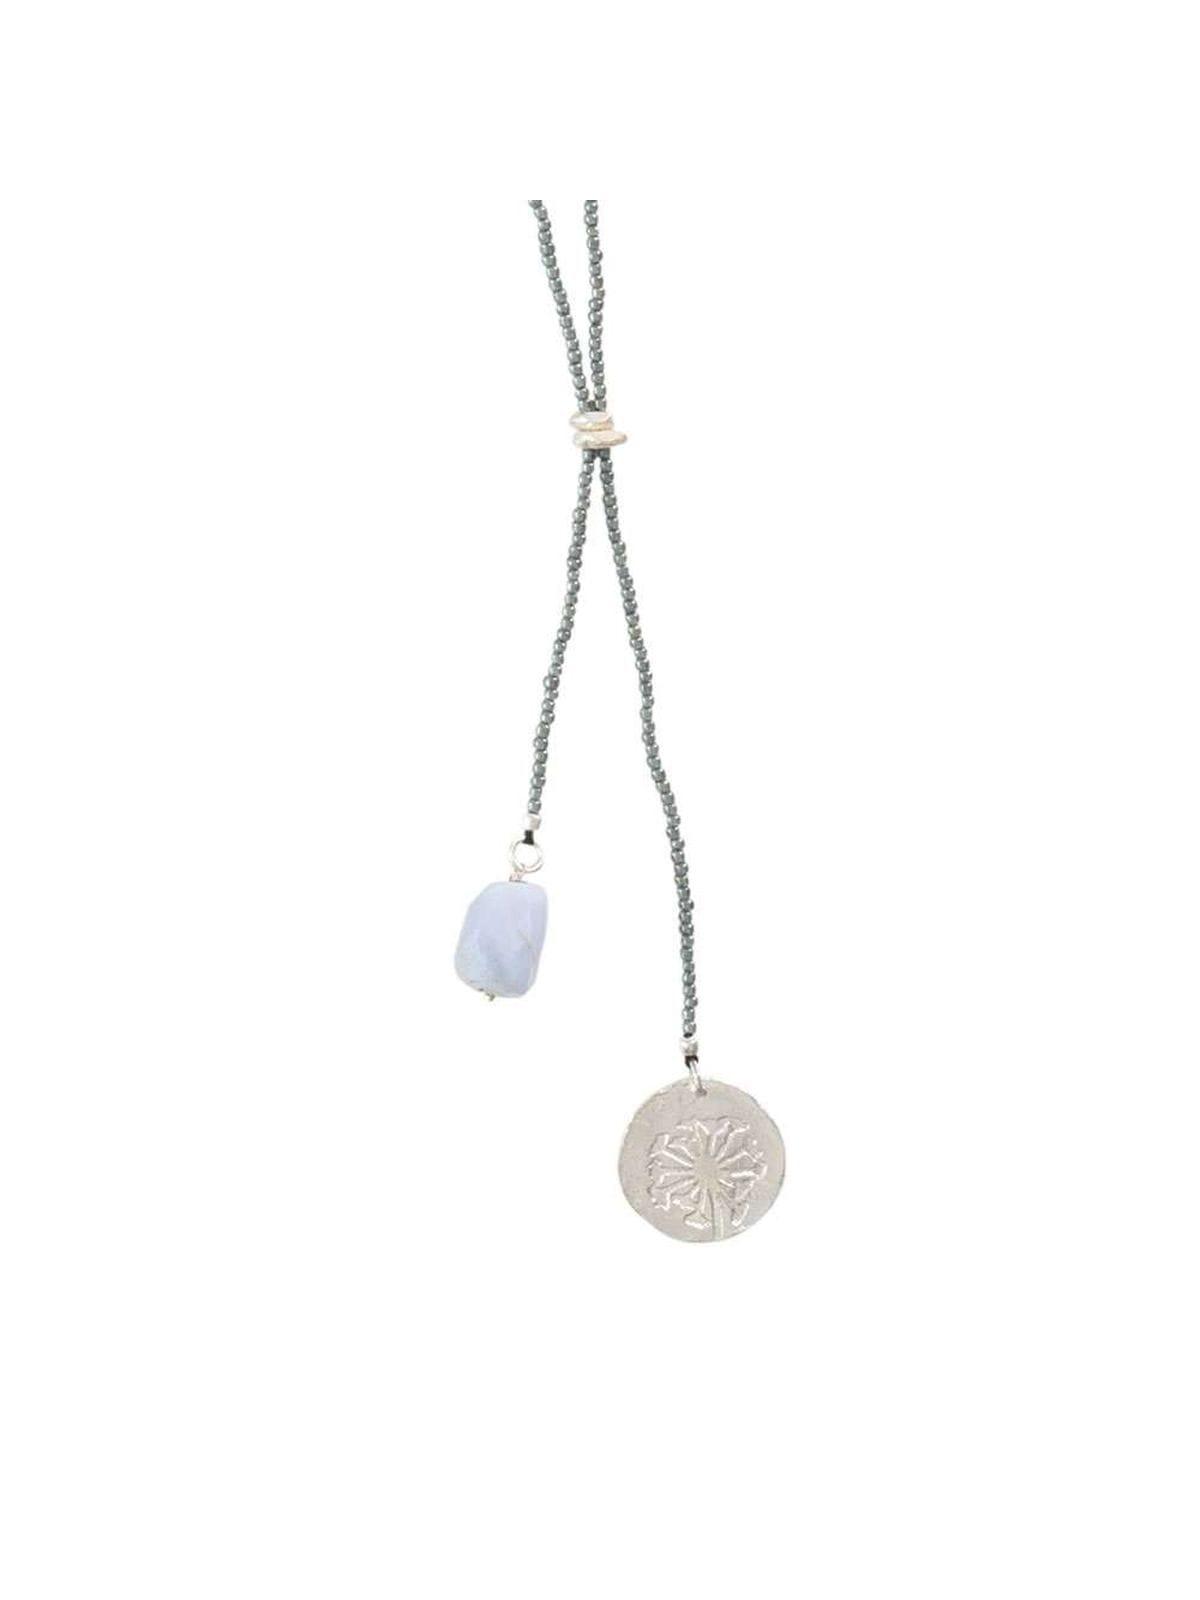 bl22558-fairy-blue-lace-agate-dandelion-coin-silver-necklace_600x600@2x_1200x1600